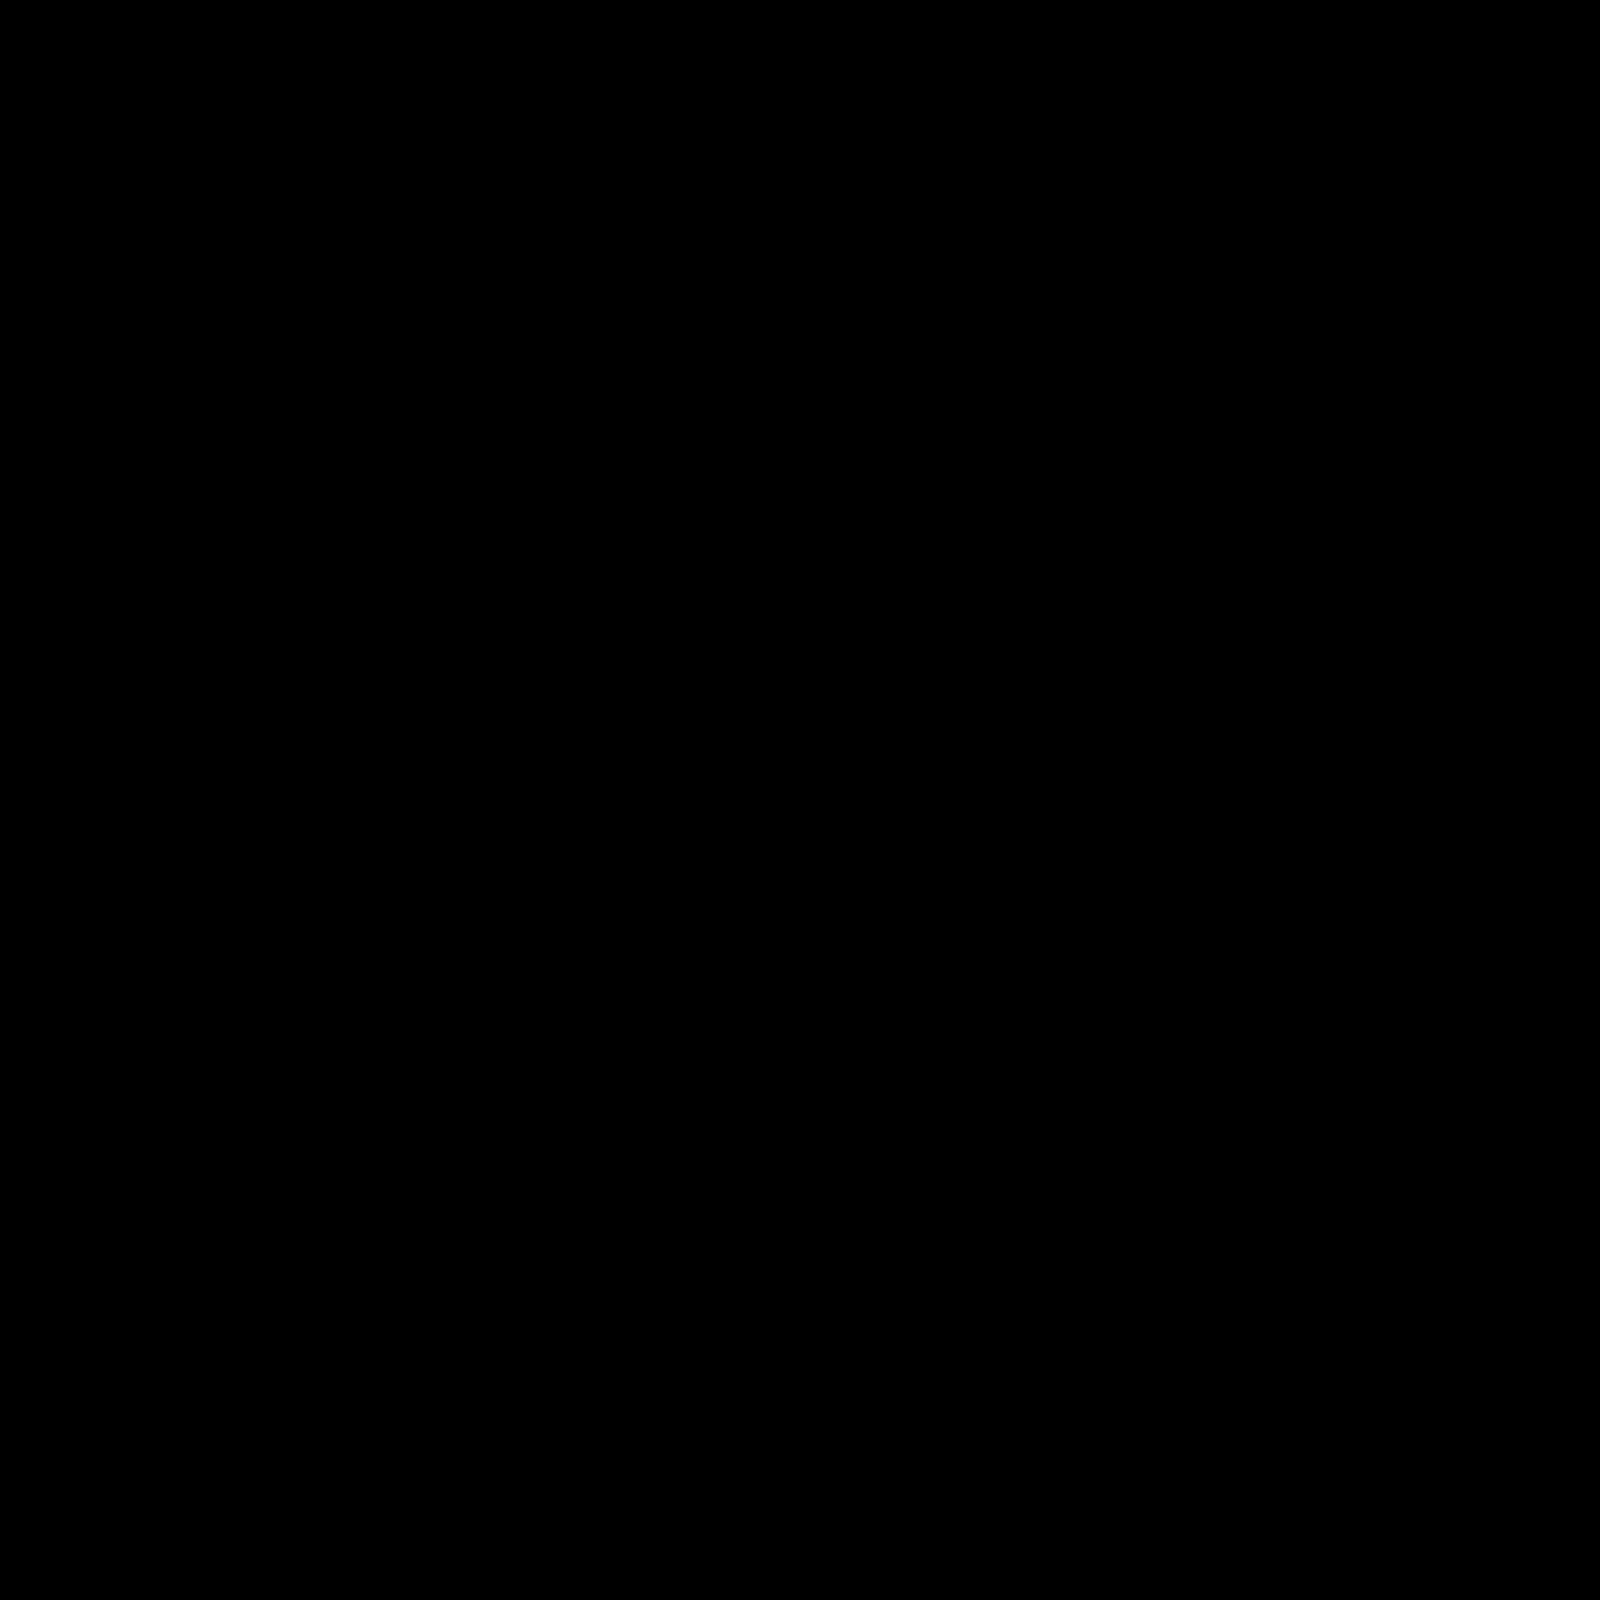 Oler icon